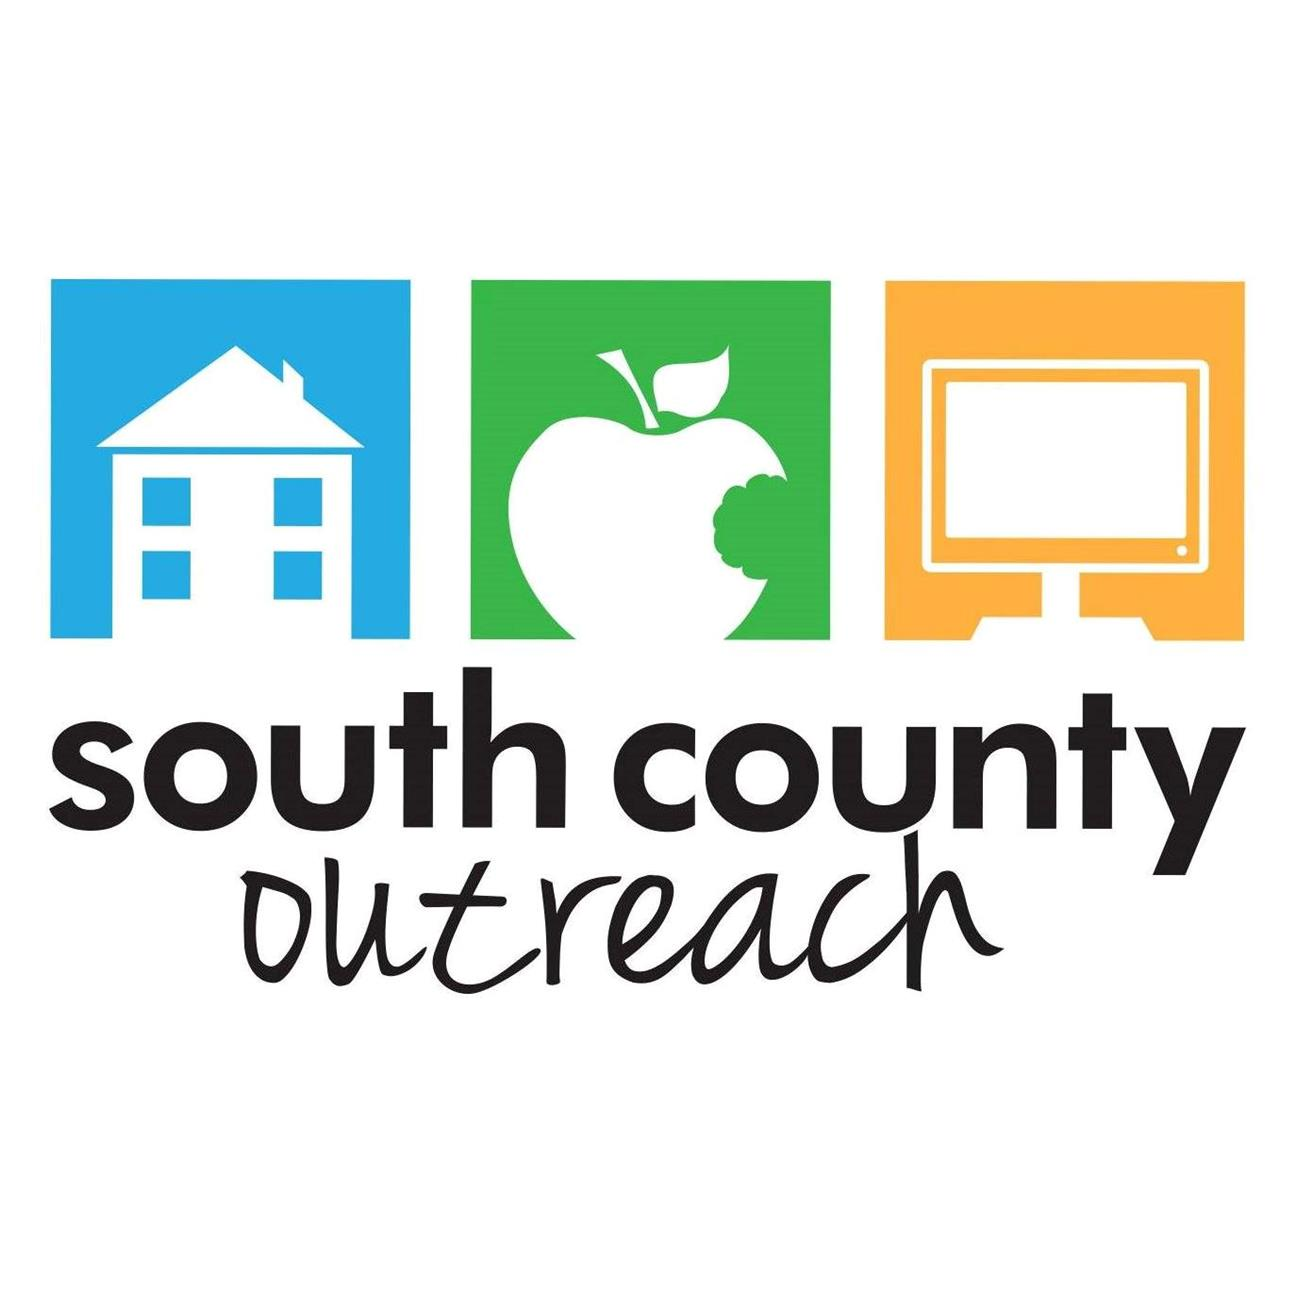 South County Outreach